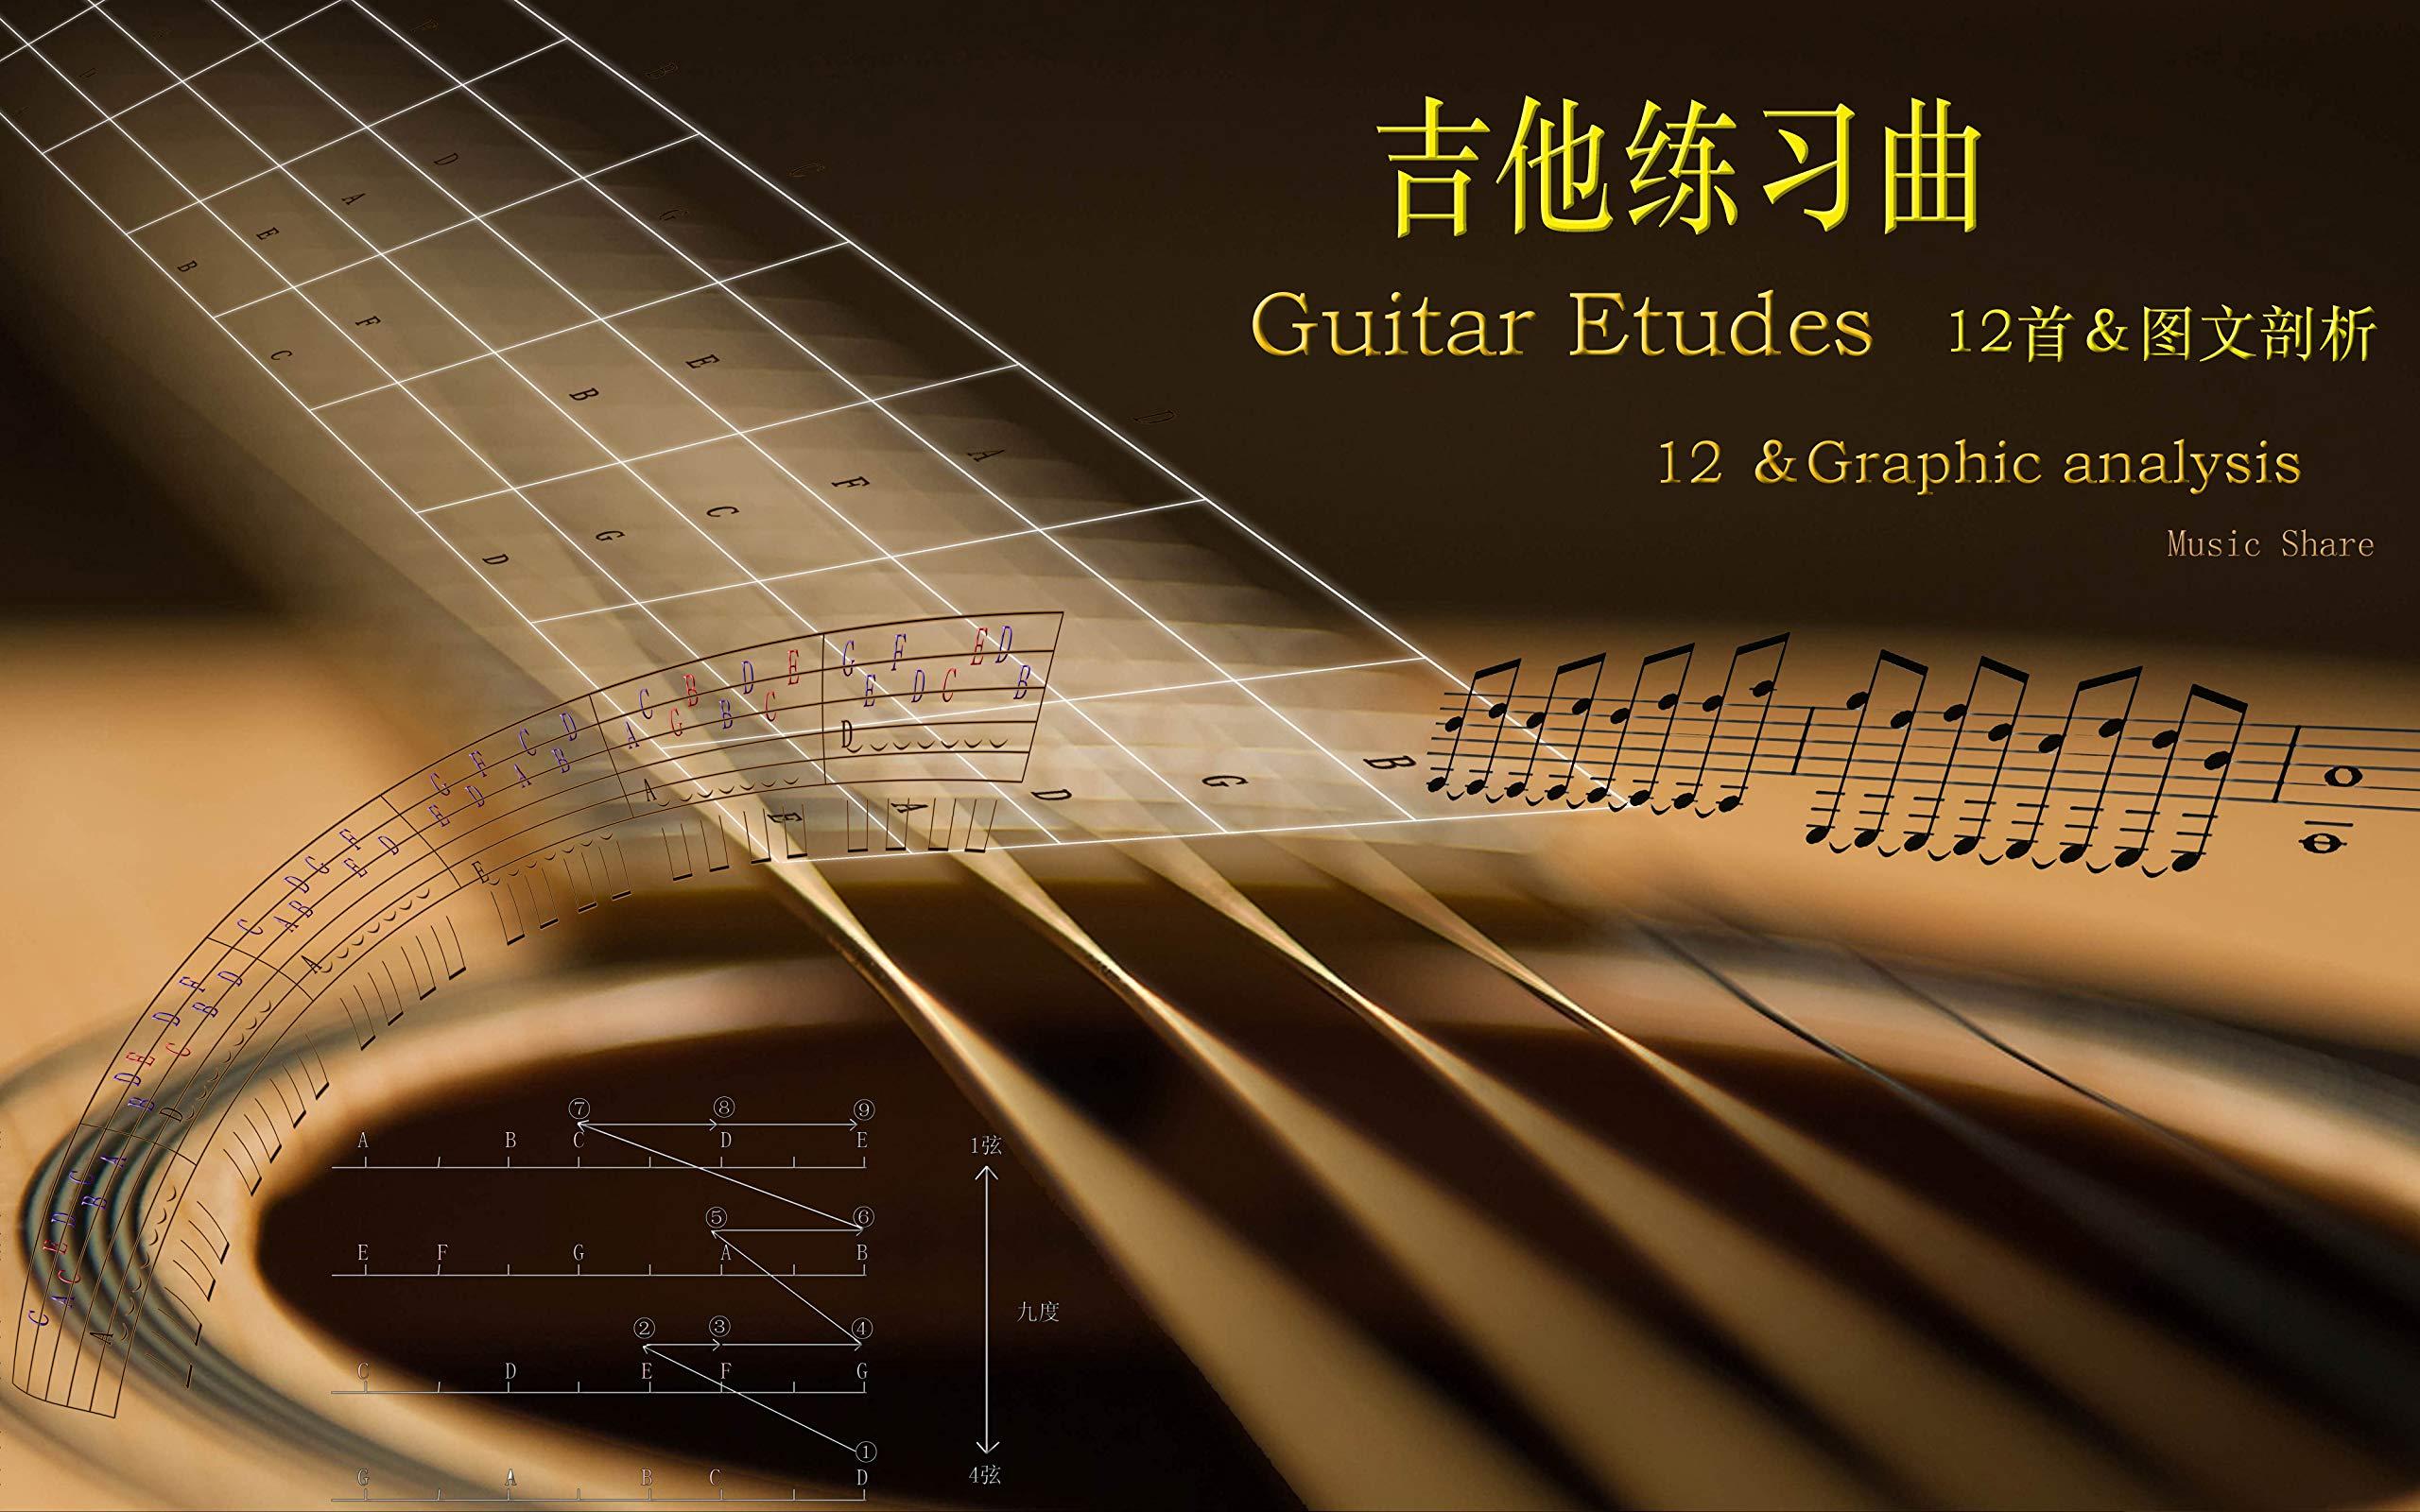 Guitar Etudes: 12 &Graphic analysis